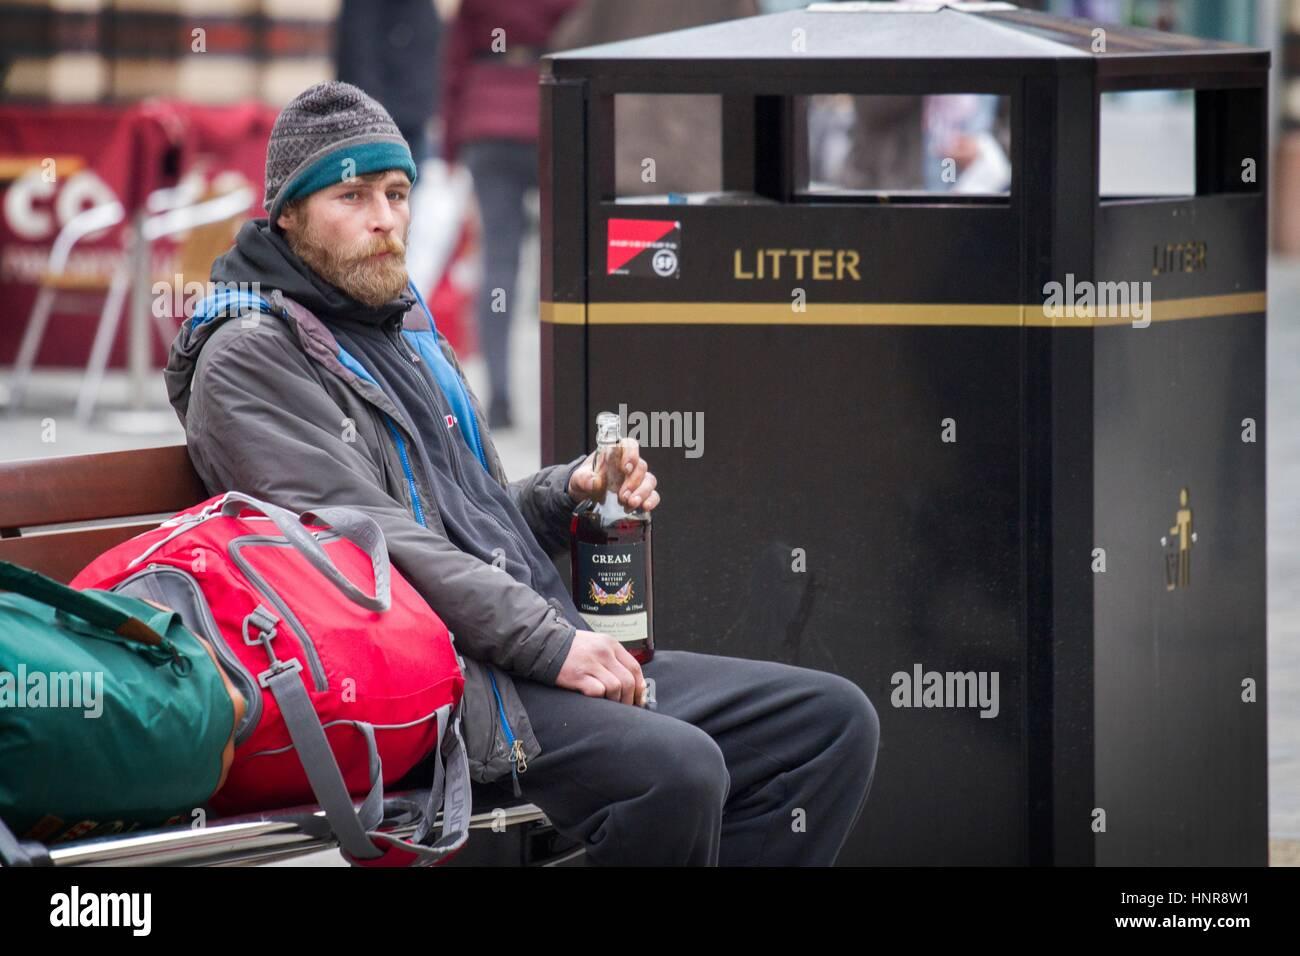 homeless homelessness sleeping rough beg beggar begging hungry cold winter sad donation money tramp hobo poor poverty - Stock Image